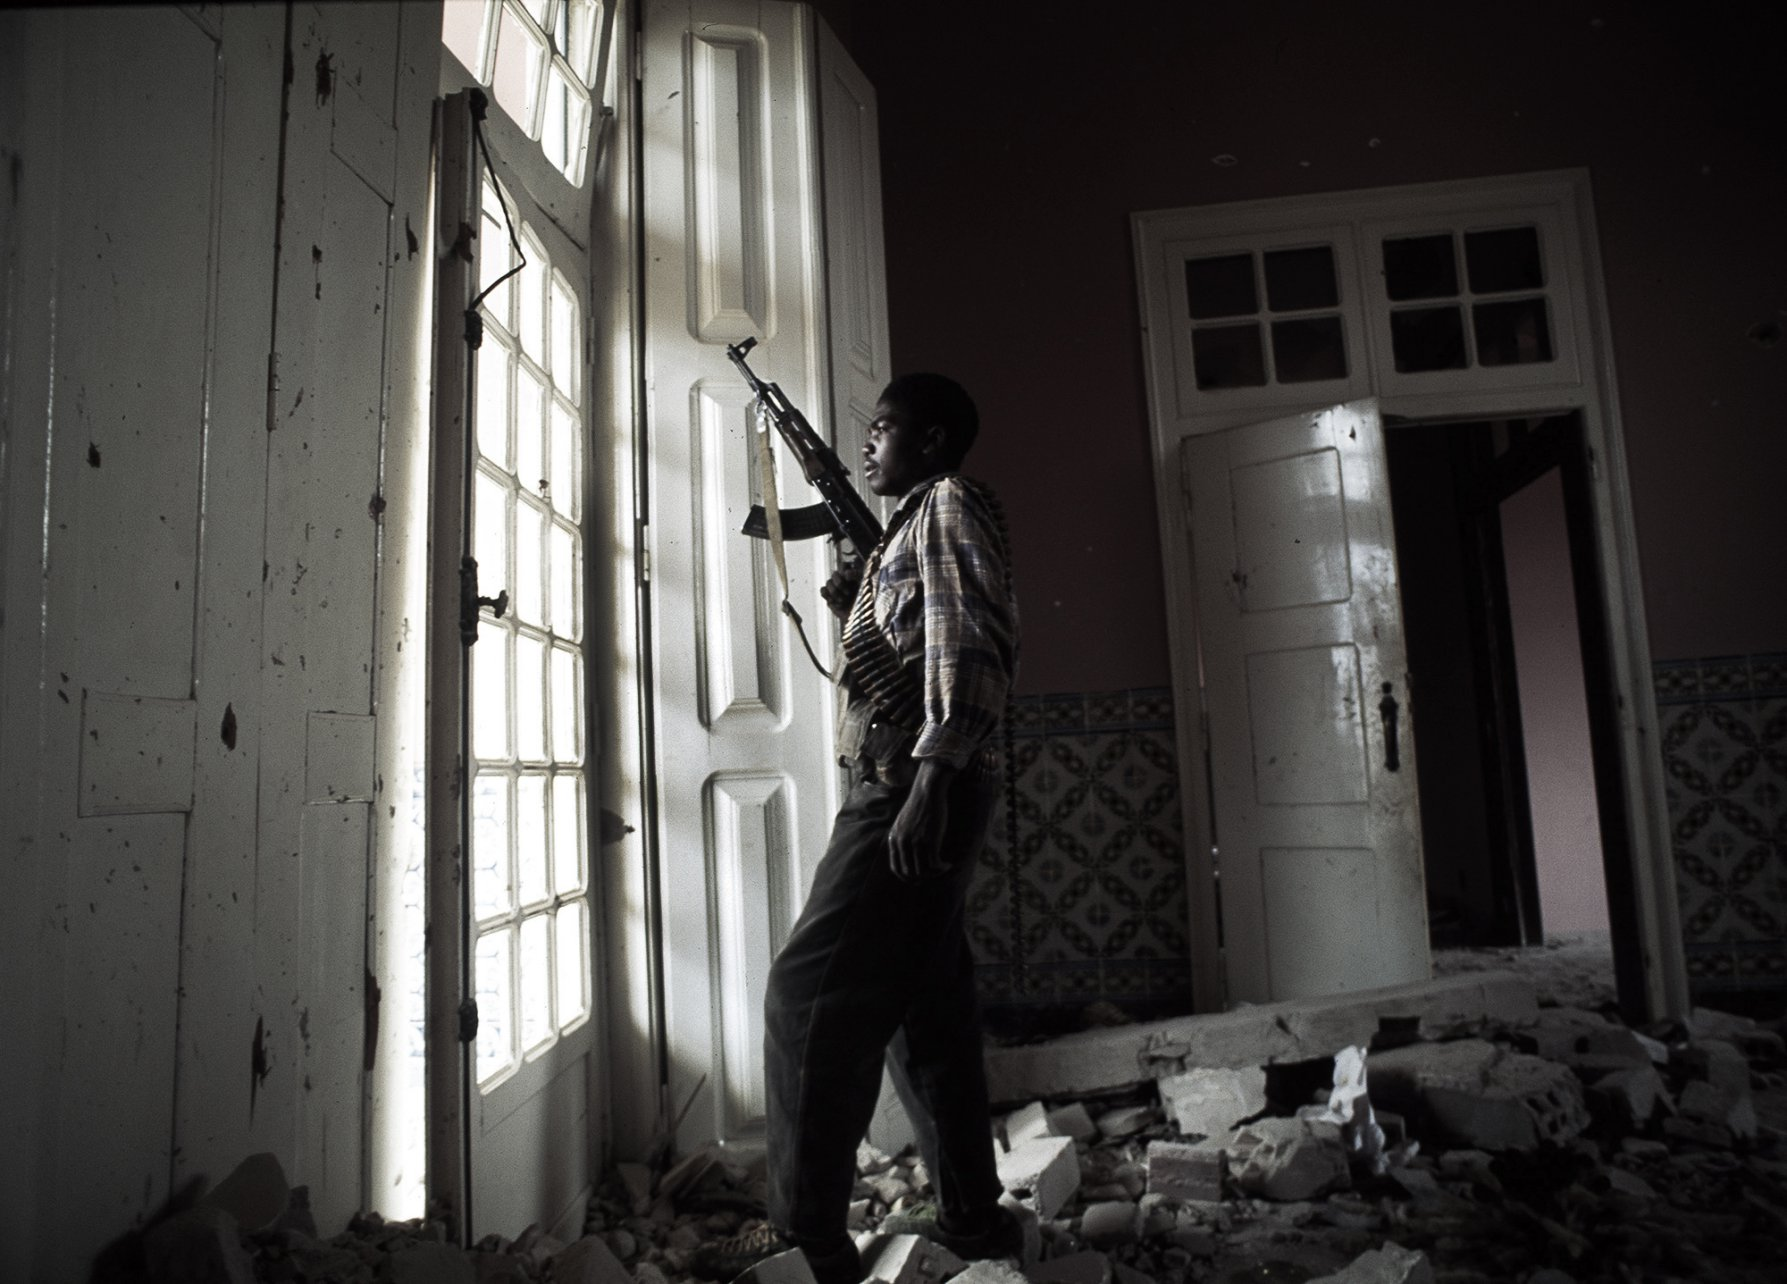 """Ceasefire"" Angola's brutal civil war. Quito, Angola 1993"